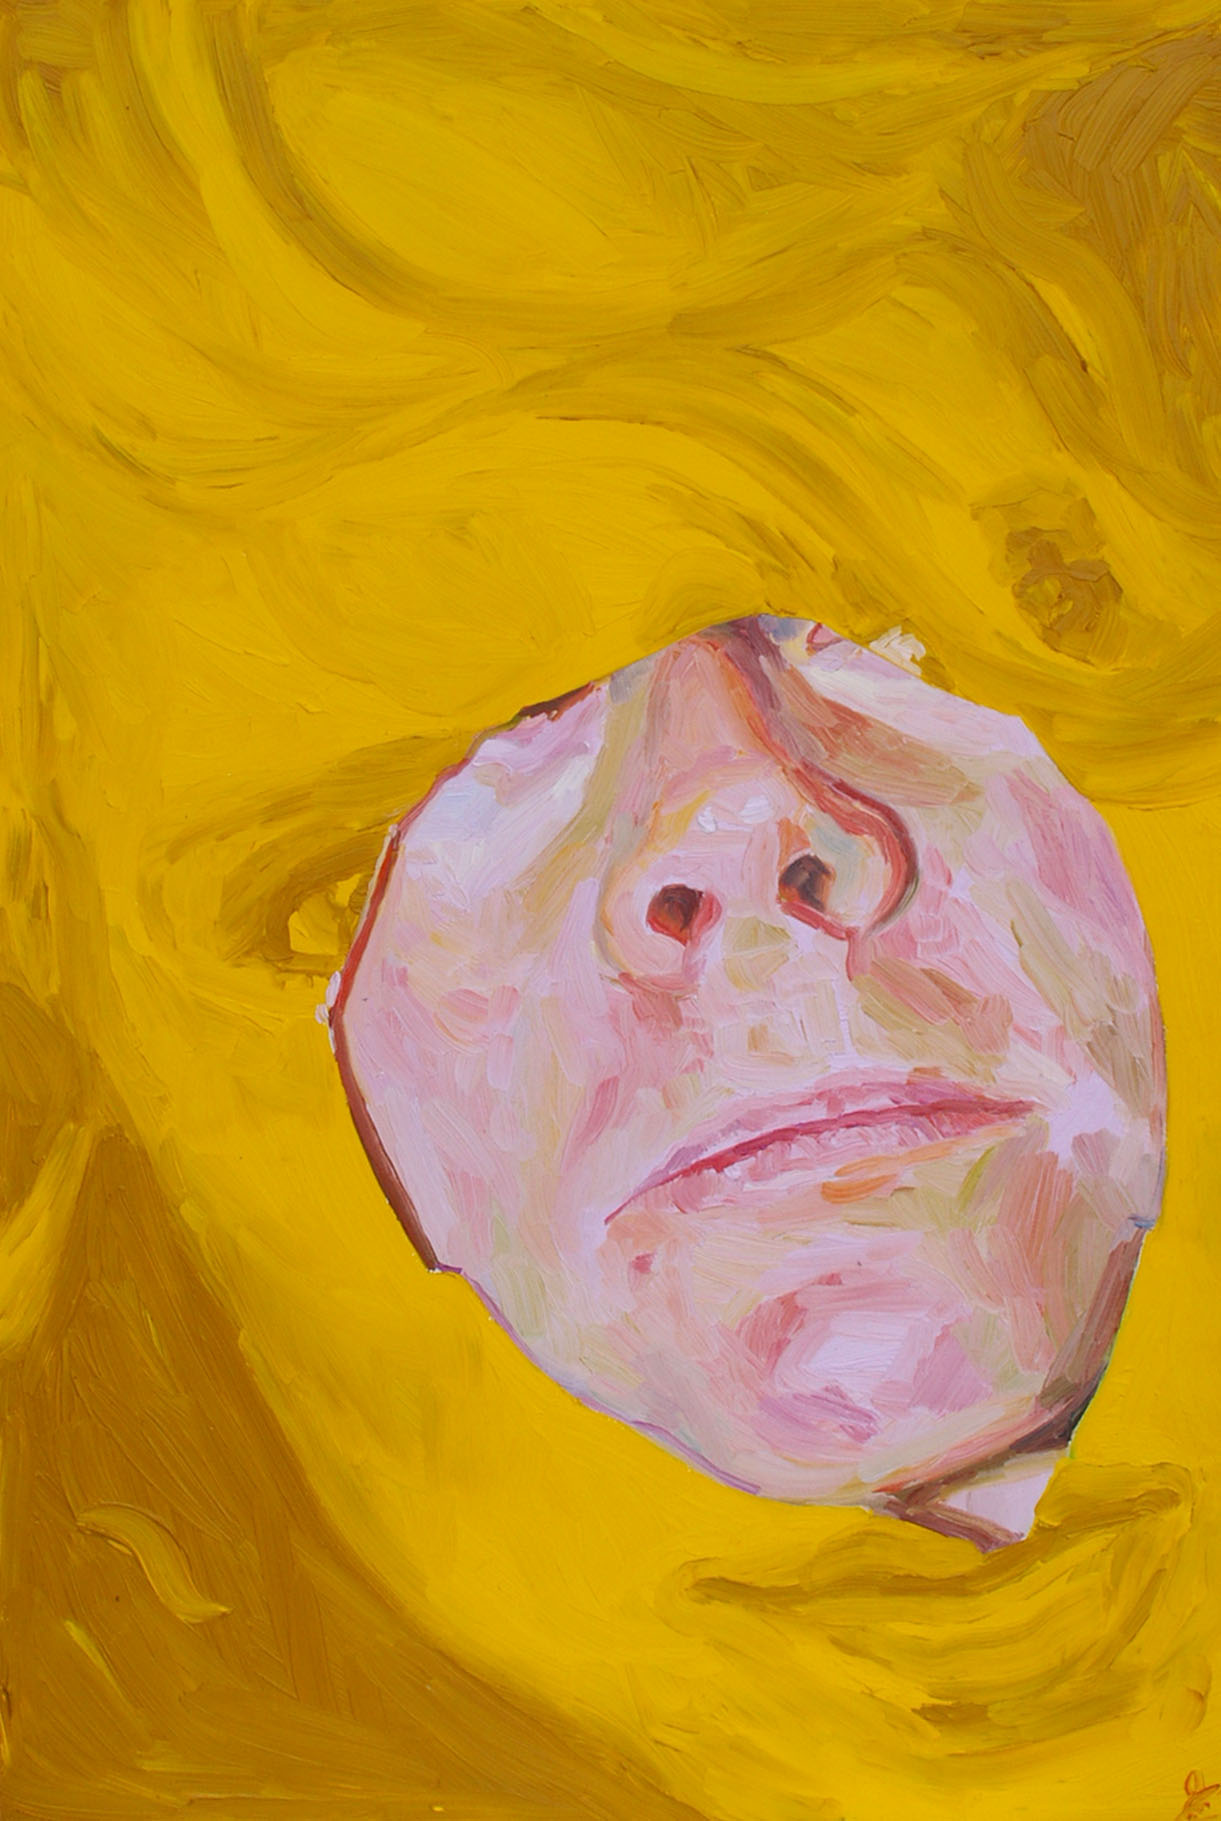 Self-Portrait in Cadium Yellow, oil on board, 60 x 40 cm, 2007.